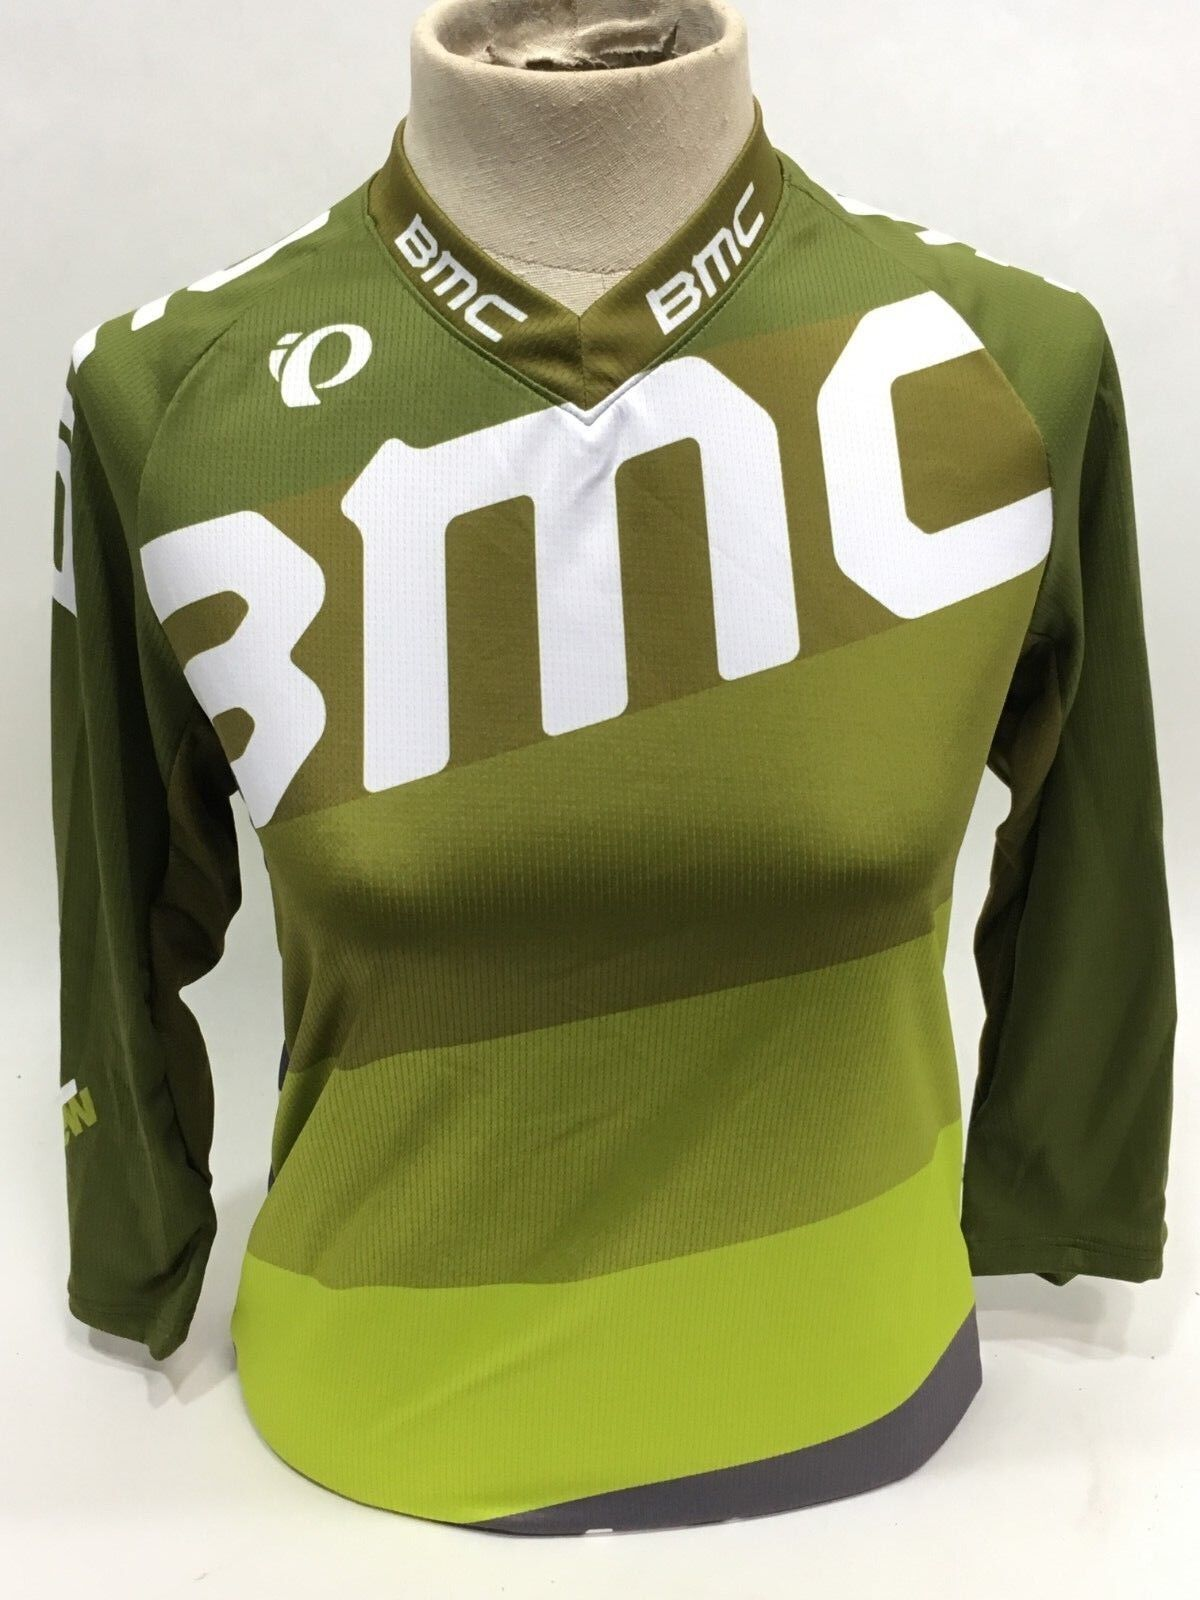 Pearl Izumi BMC Trailcrew Bicicleta de Montaña Jersey Holgado Lima para Dama -